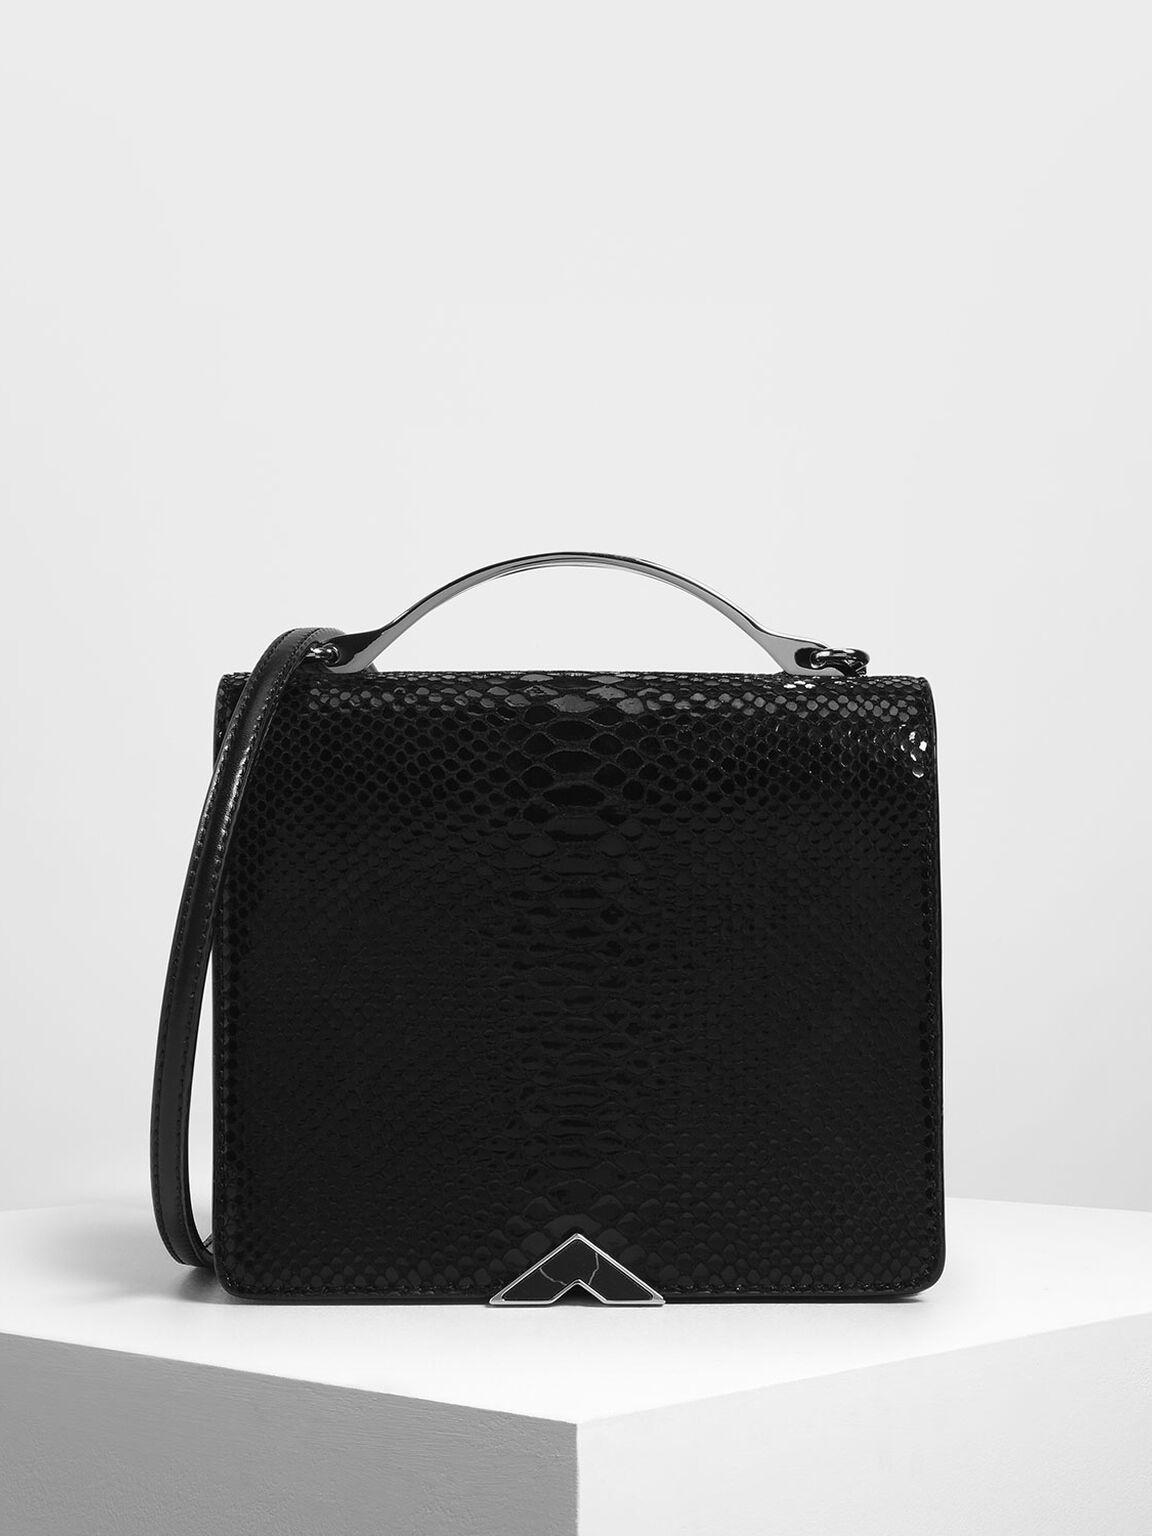 Snake Print Top Handle Bag, Black, hi-res